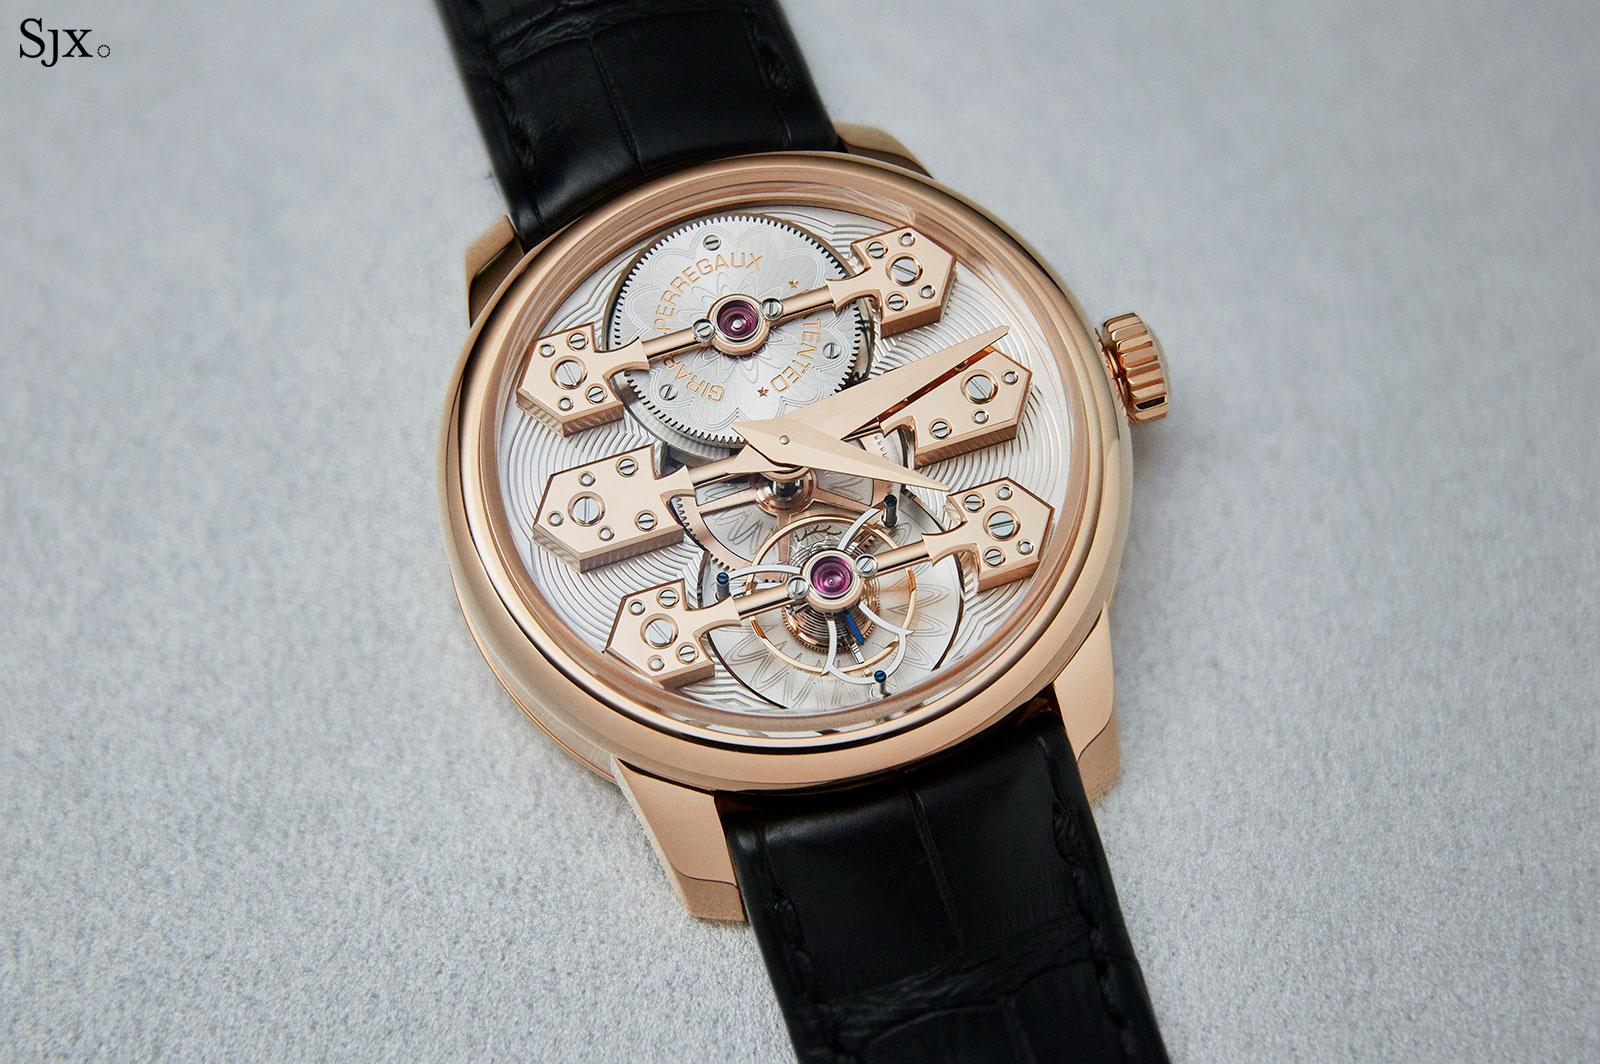 Girard Perregaux La Esmeralda Tourbillon watch